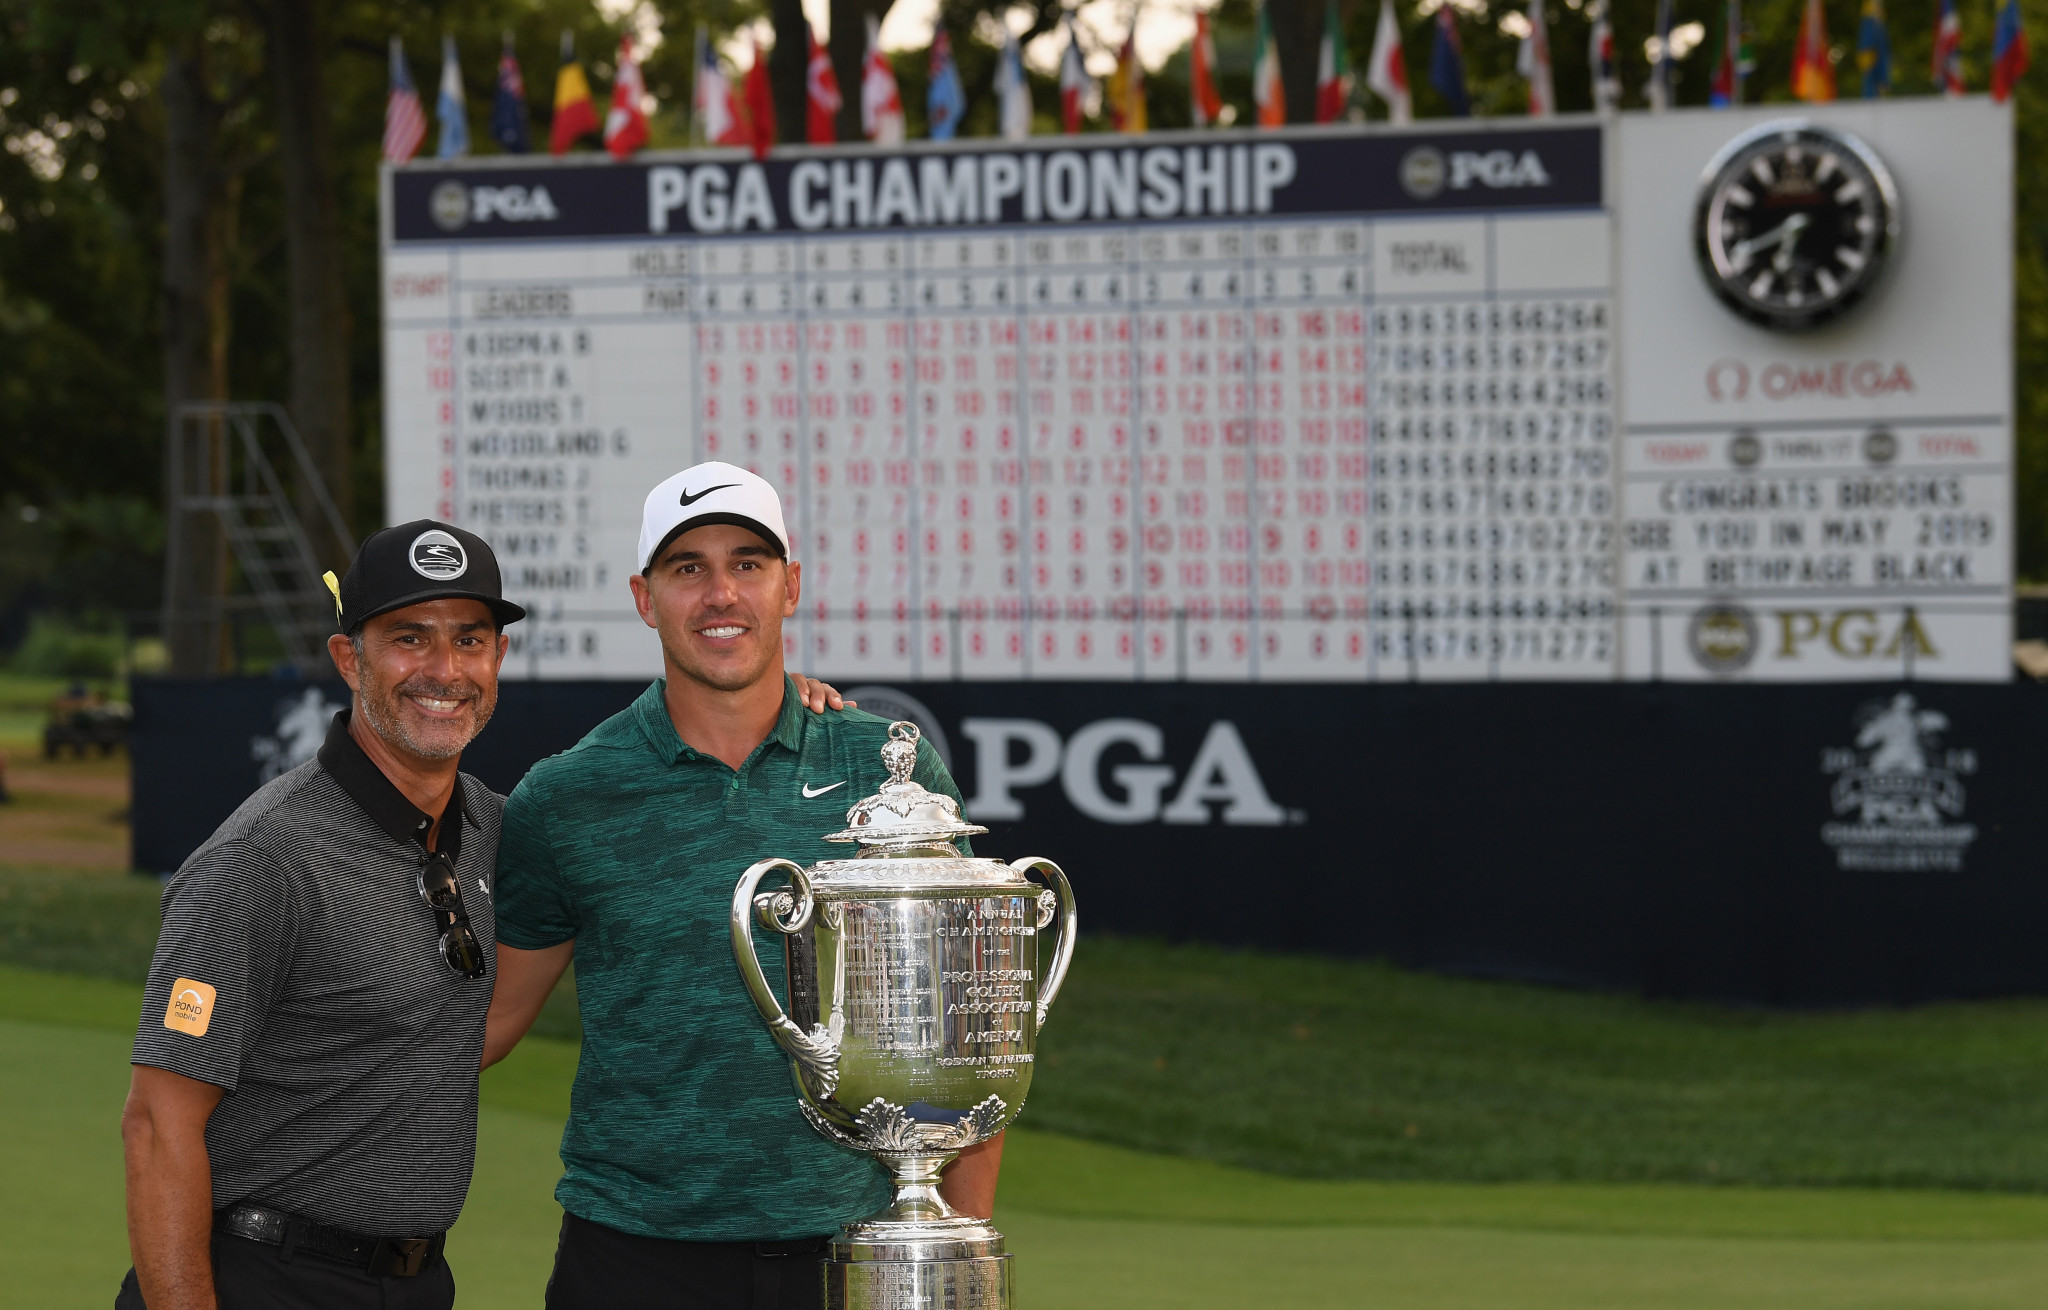 Koepka wins PGA Championship amid Woods resurgance